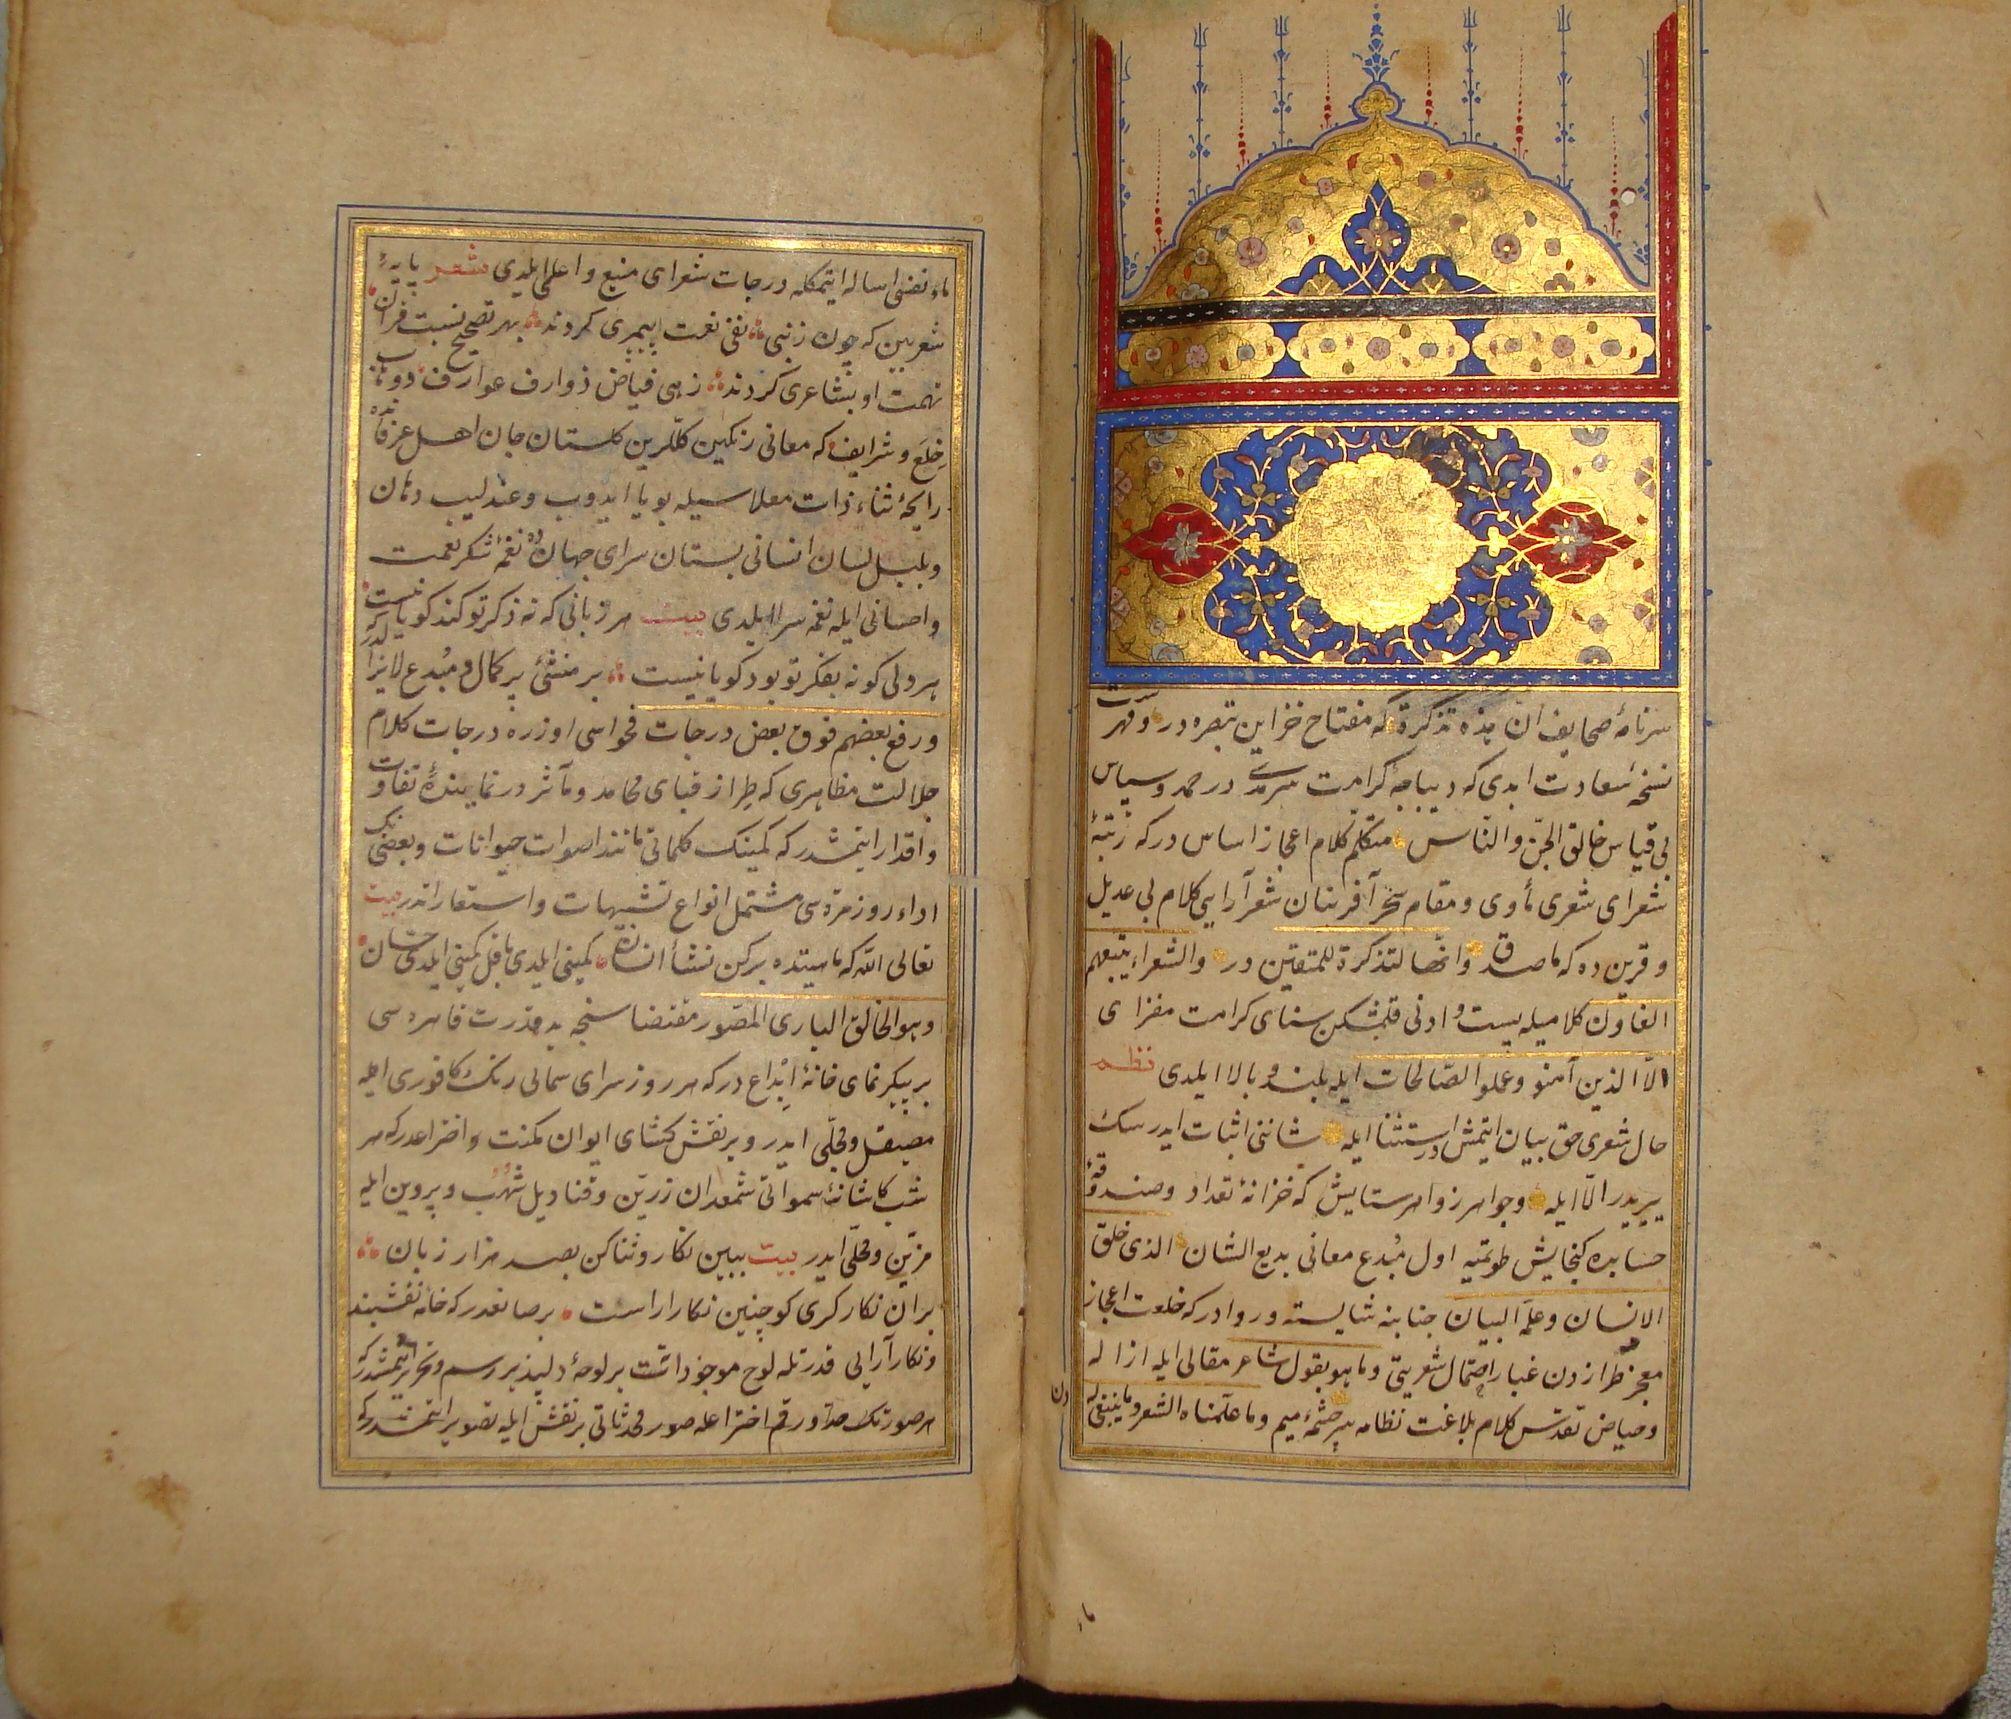 Fine Ottoman Turkish manuscript copied by an important scribe during the author's life time , Tezkire-i Hasan Celebi or Tezkiret-u Suara (Tezkiretü'ş-şuarâ تذكرة الشعراء) by Kinalizade Hasan Celebi (1012 AH - 1604